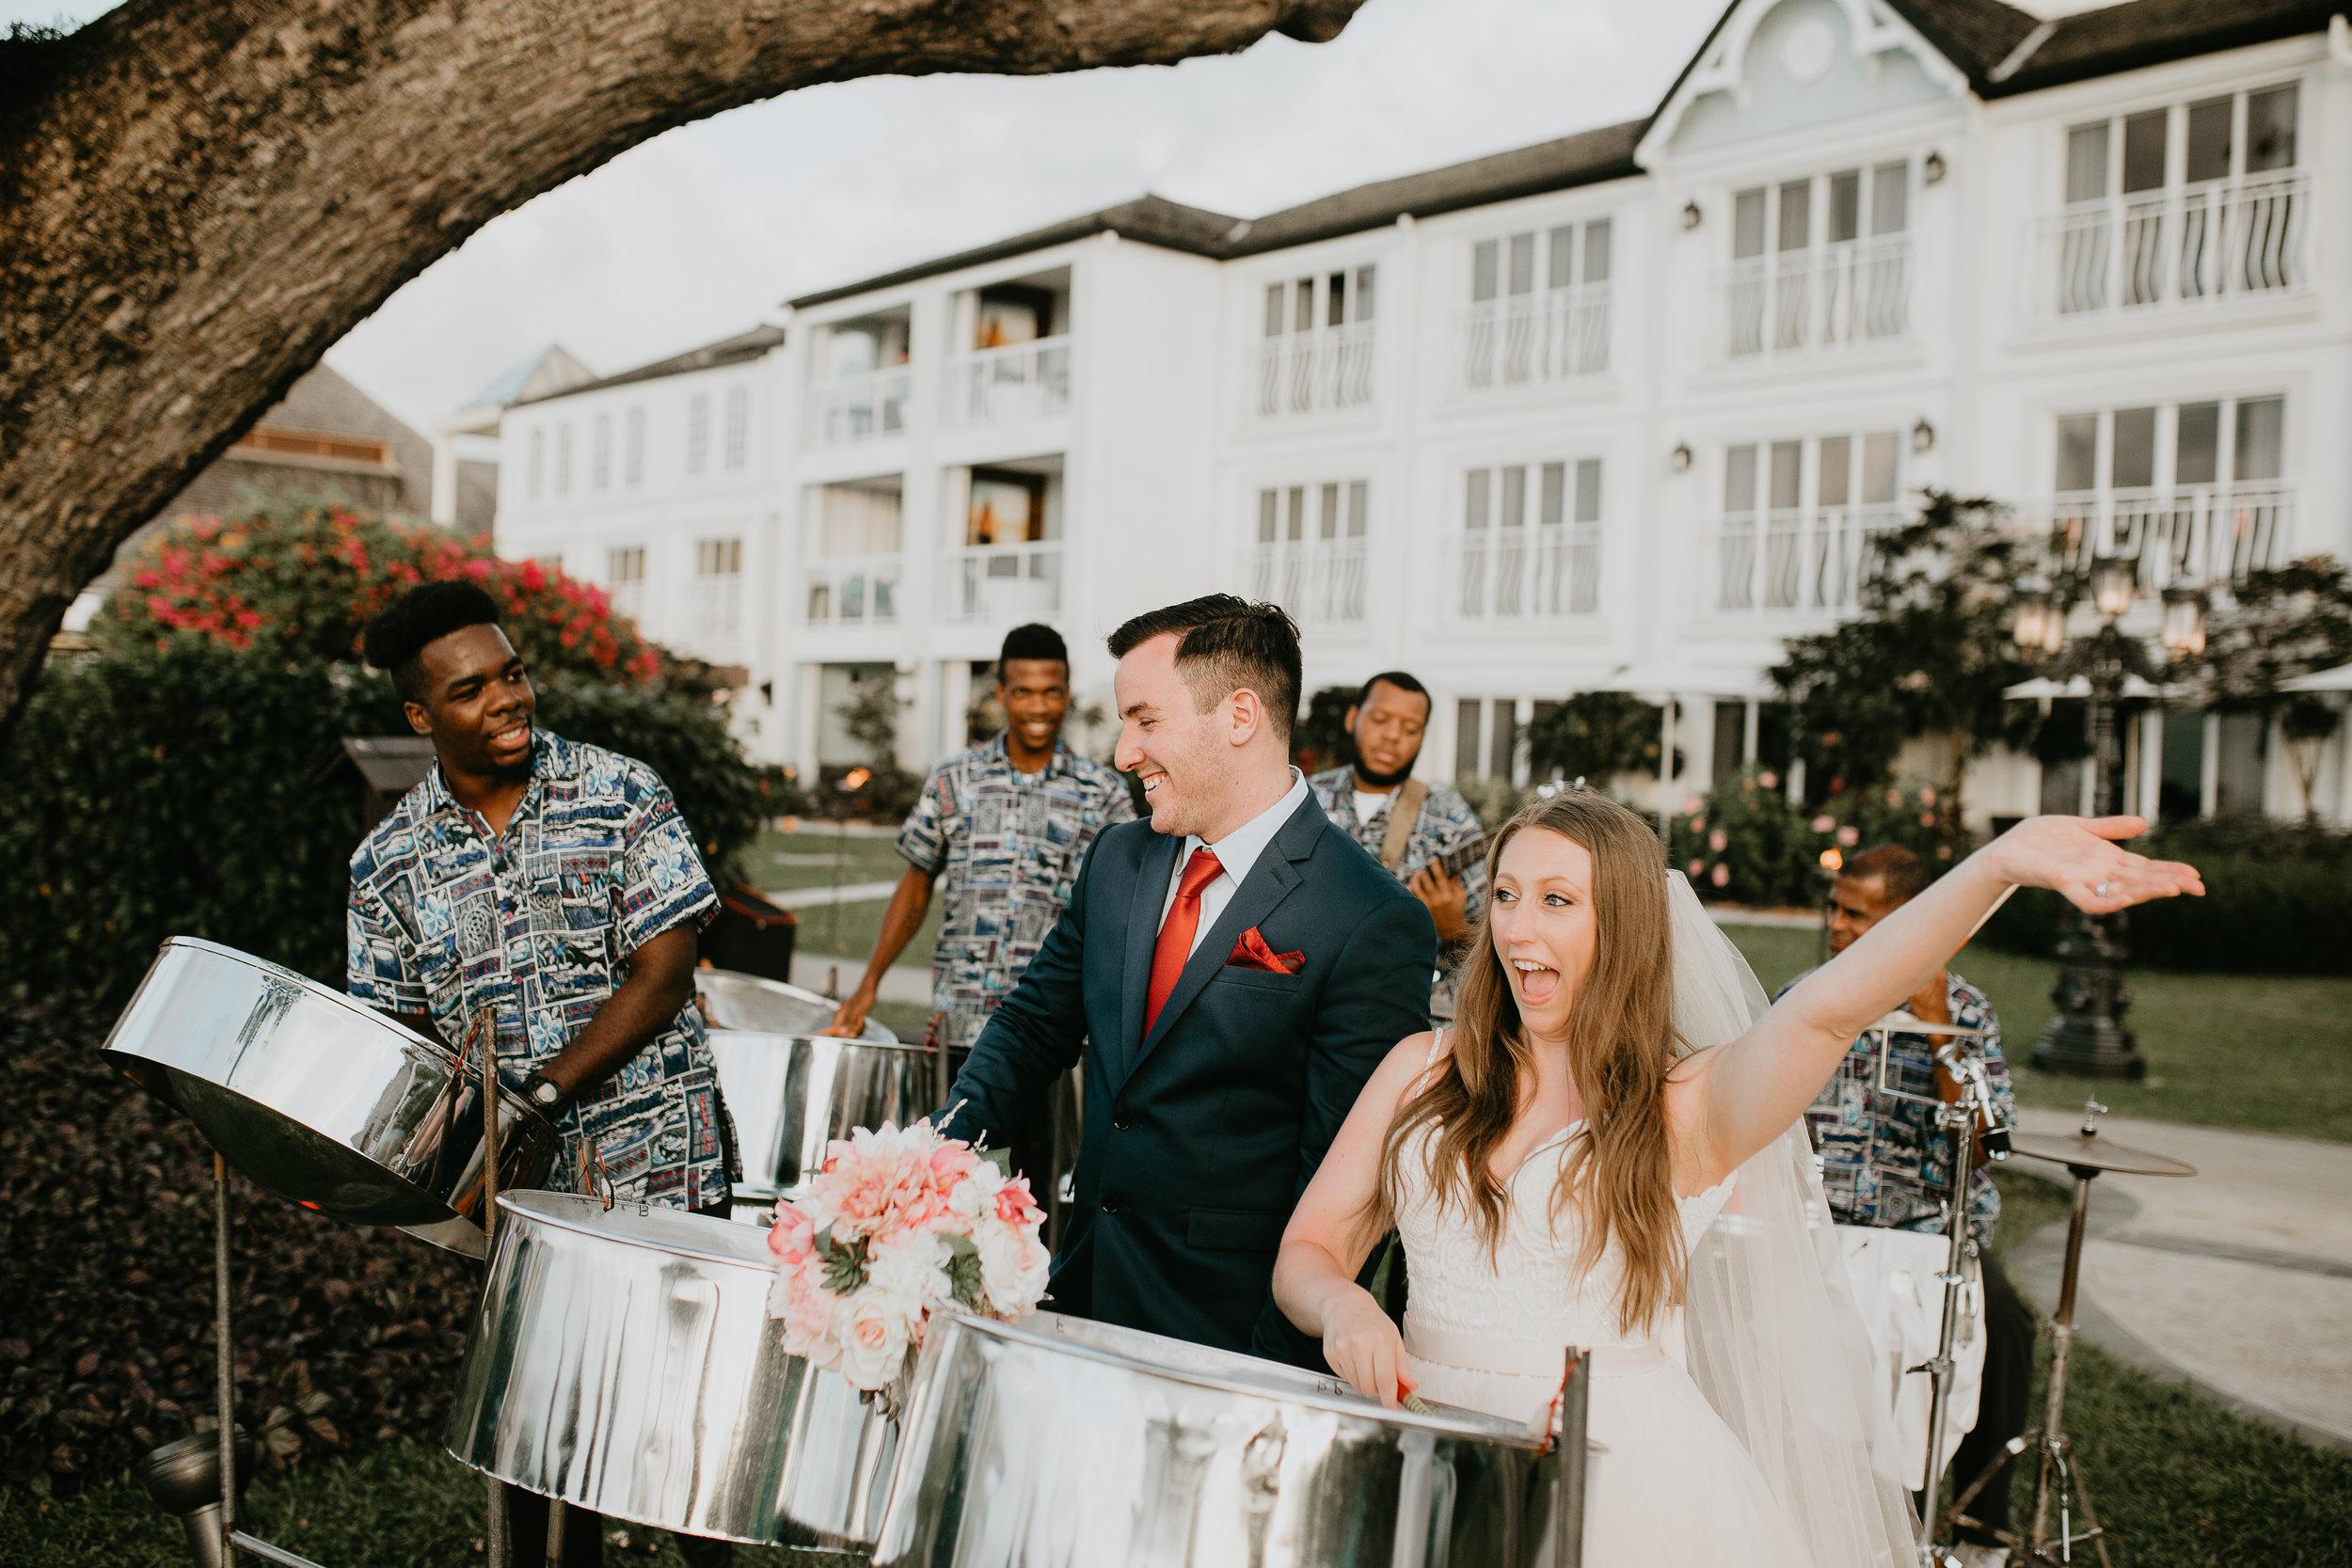 nicole-daacke-photography-destination-wedding-in-st-lucia-sandals-la-toc-intimate-island-wedding-carribean-elopement-photographer-chill-island-wedding-115.jpg